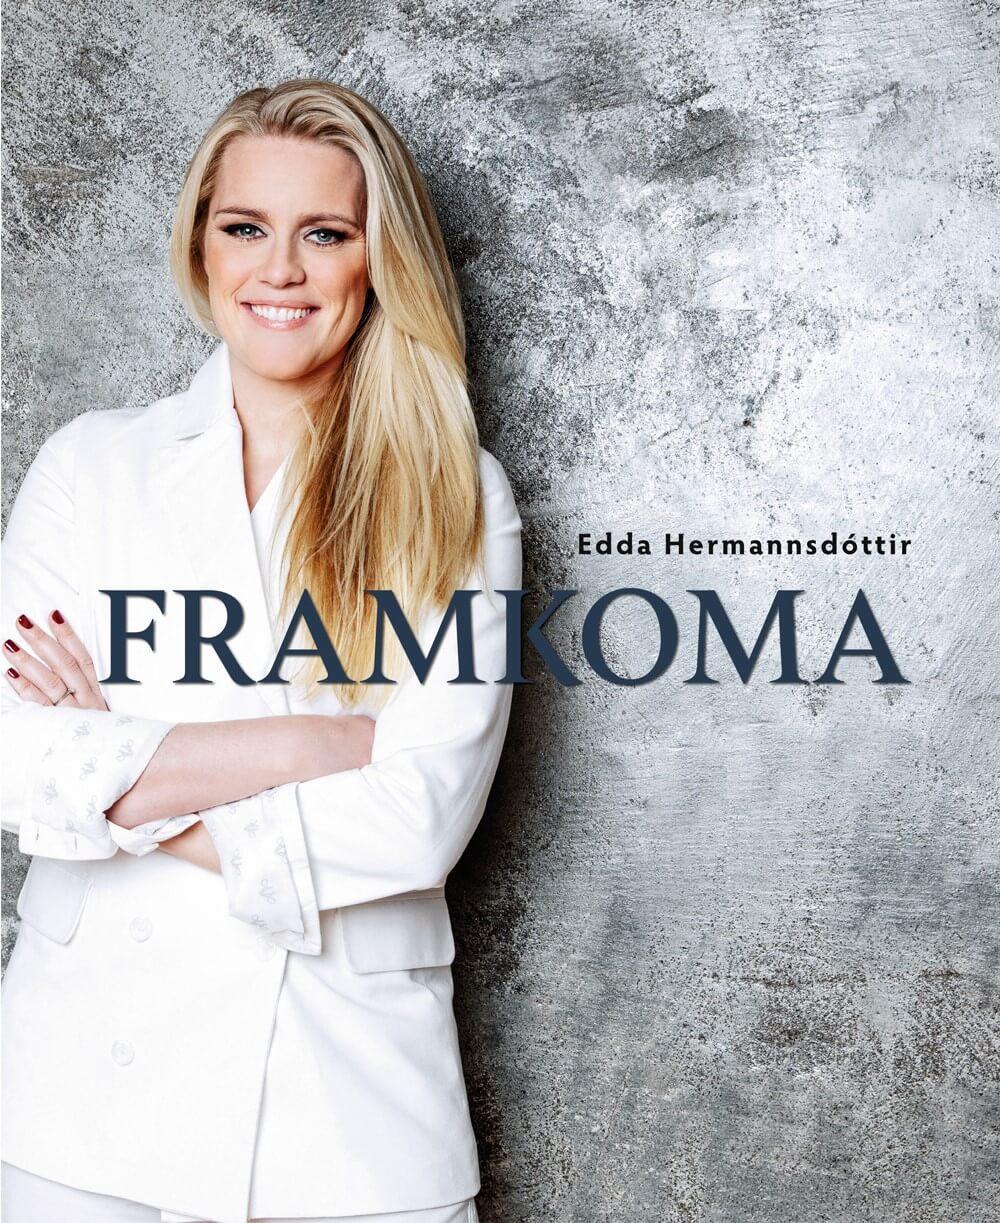 Framkoma